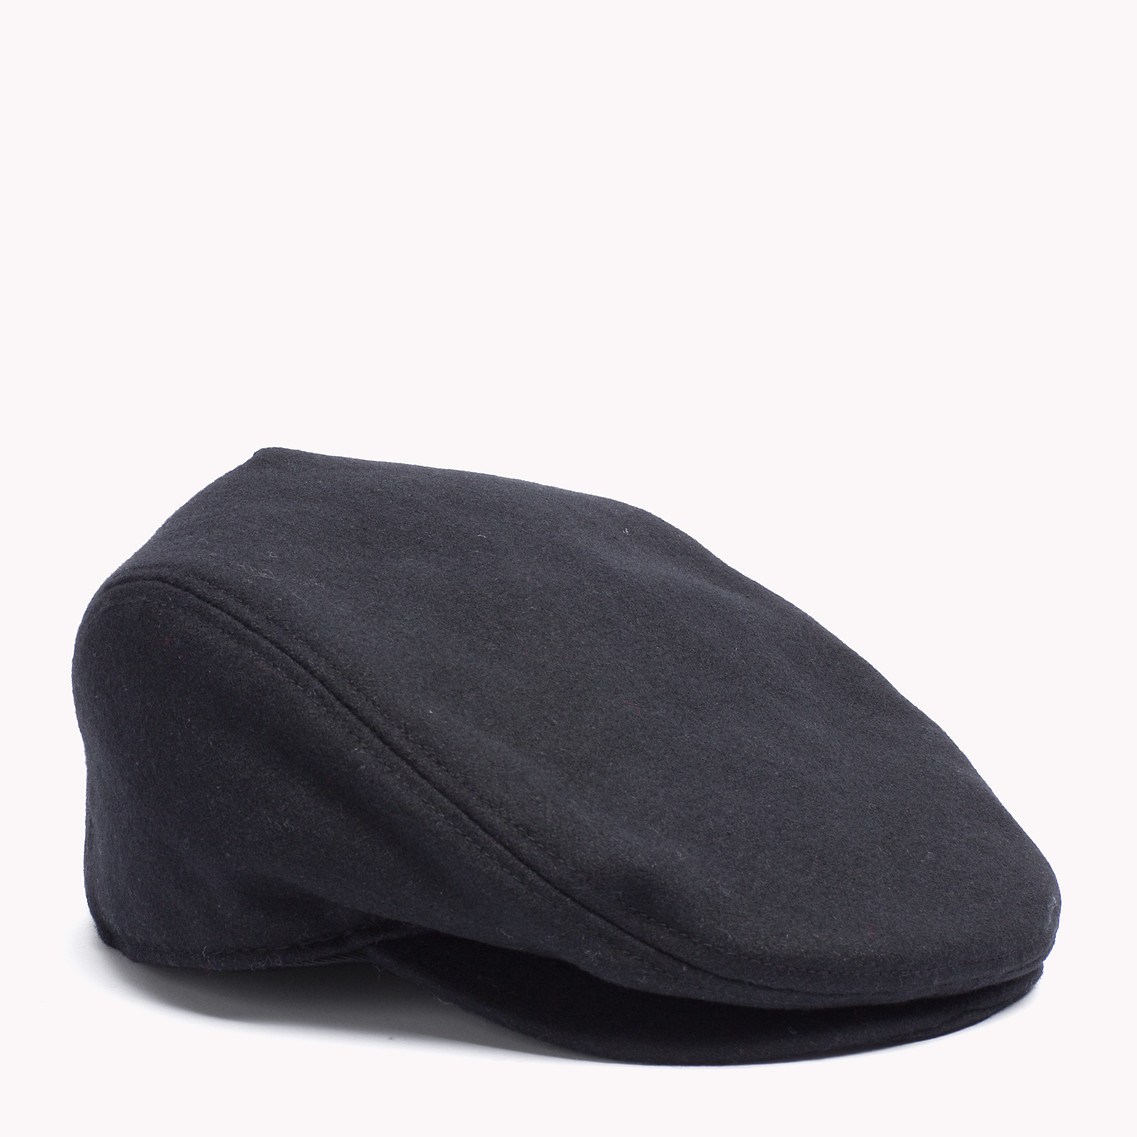 Tommy Hilfiger Wool Blend Cap in Black for Men - Lyst fdbc6106baf